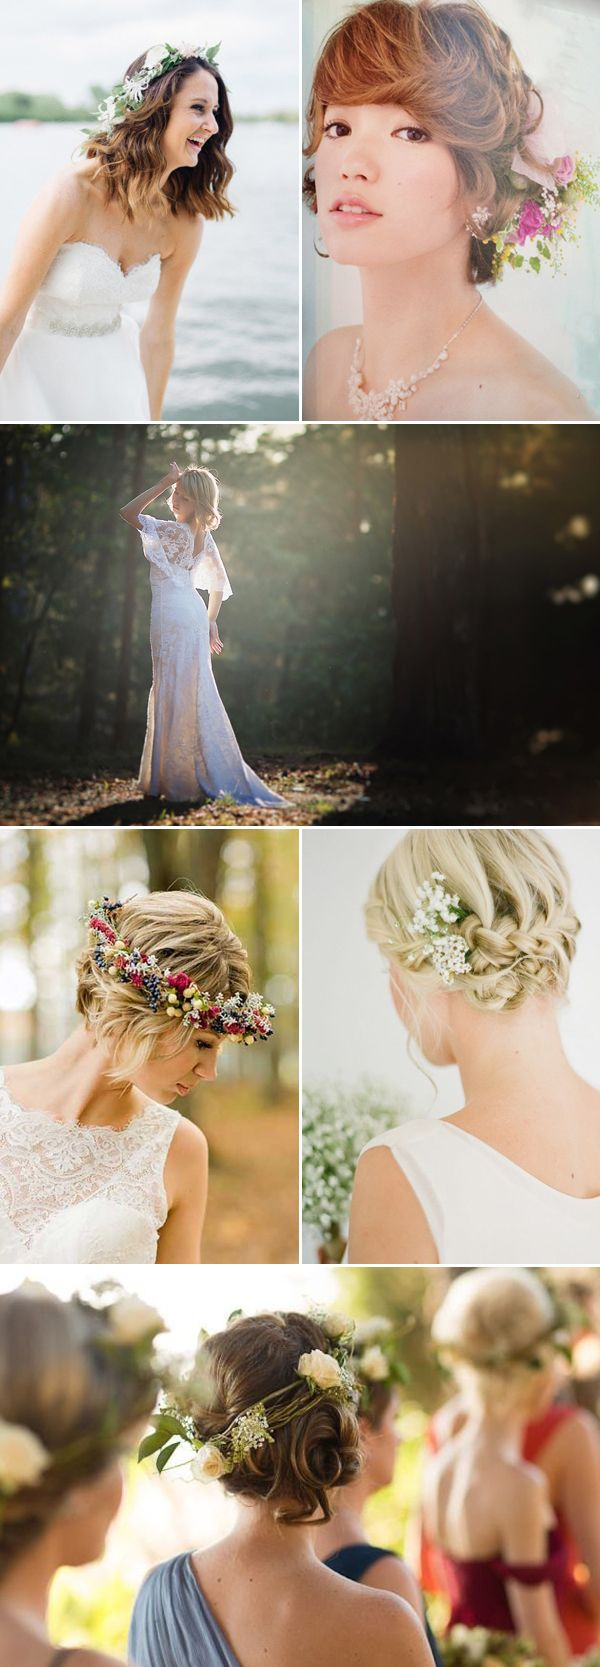 39 best images about weddings on pinterest | wedding, wedding